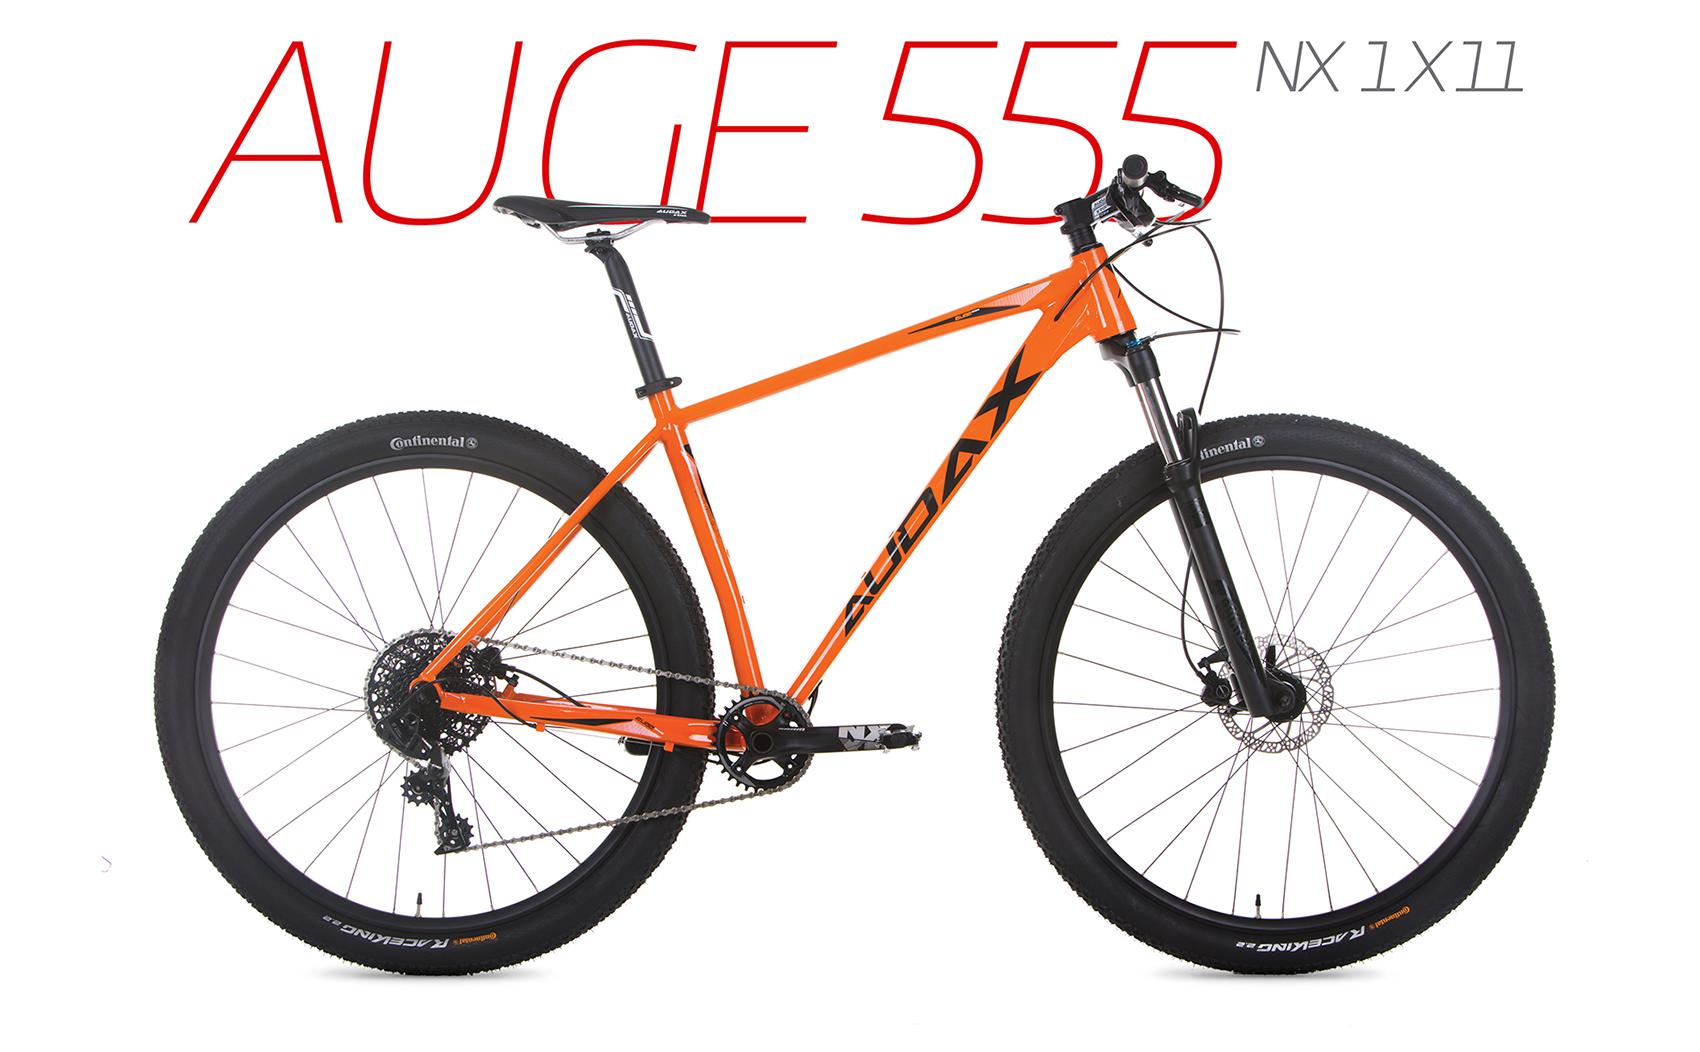 AUGE 555 NX <small> usai </small>